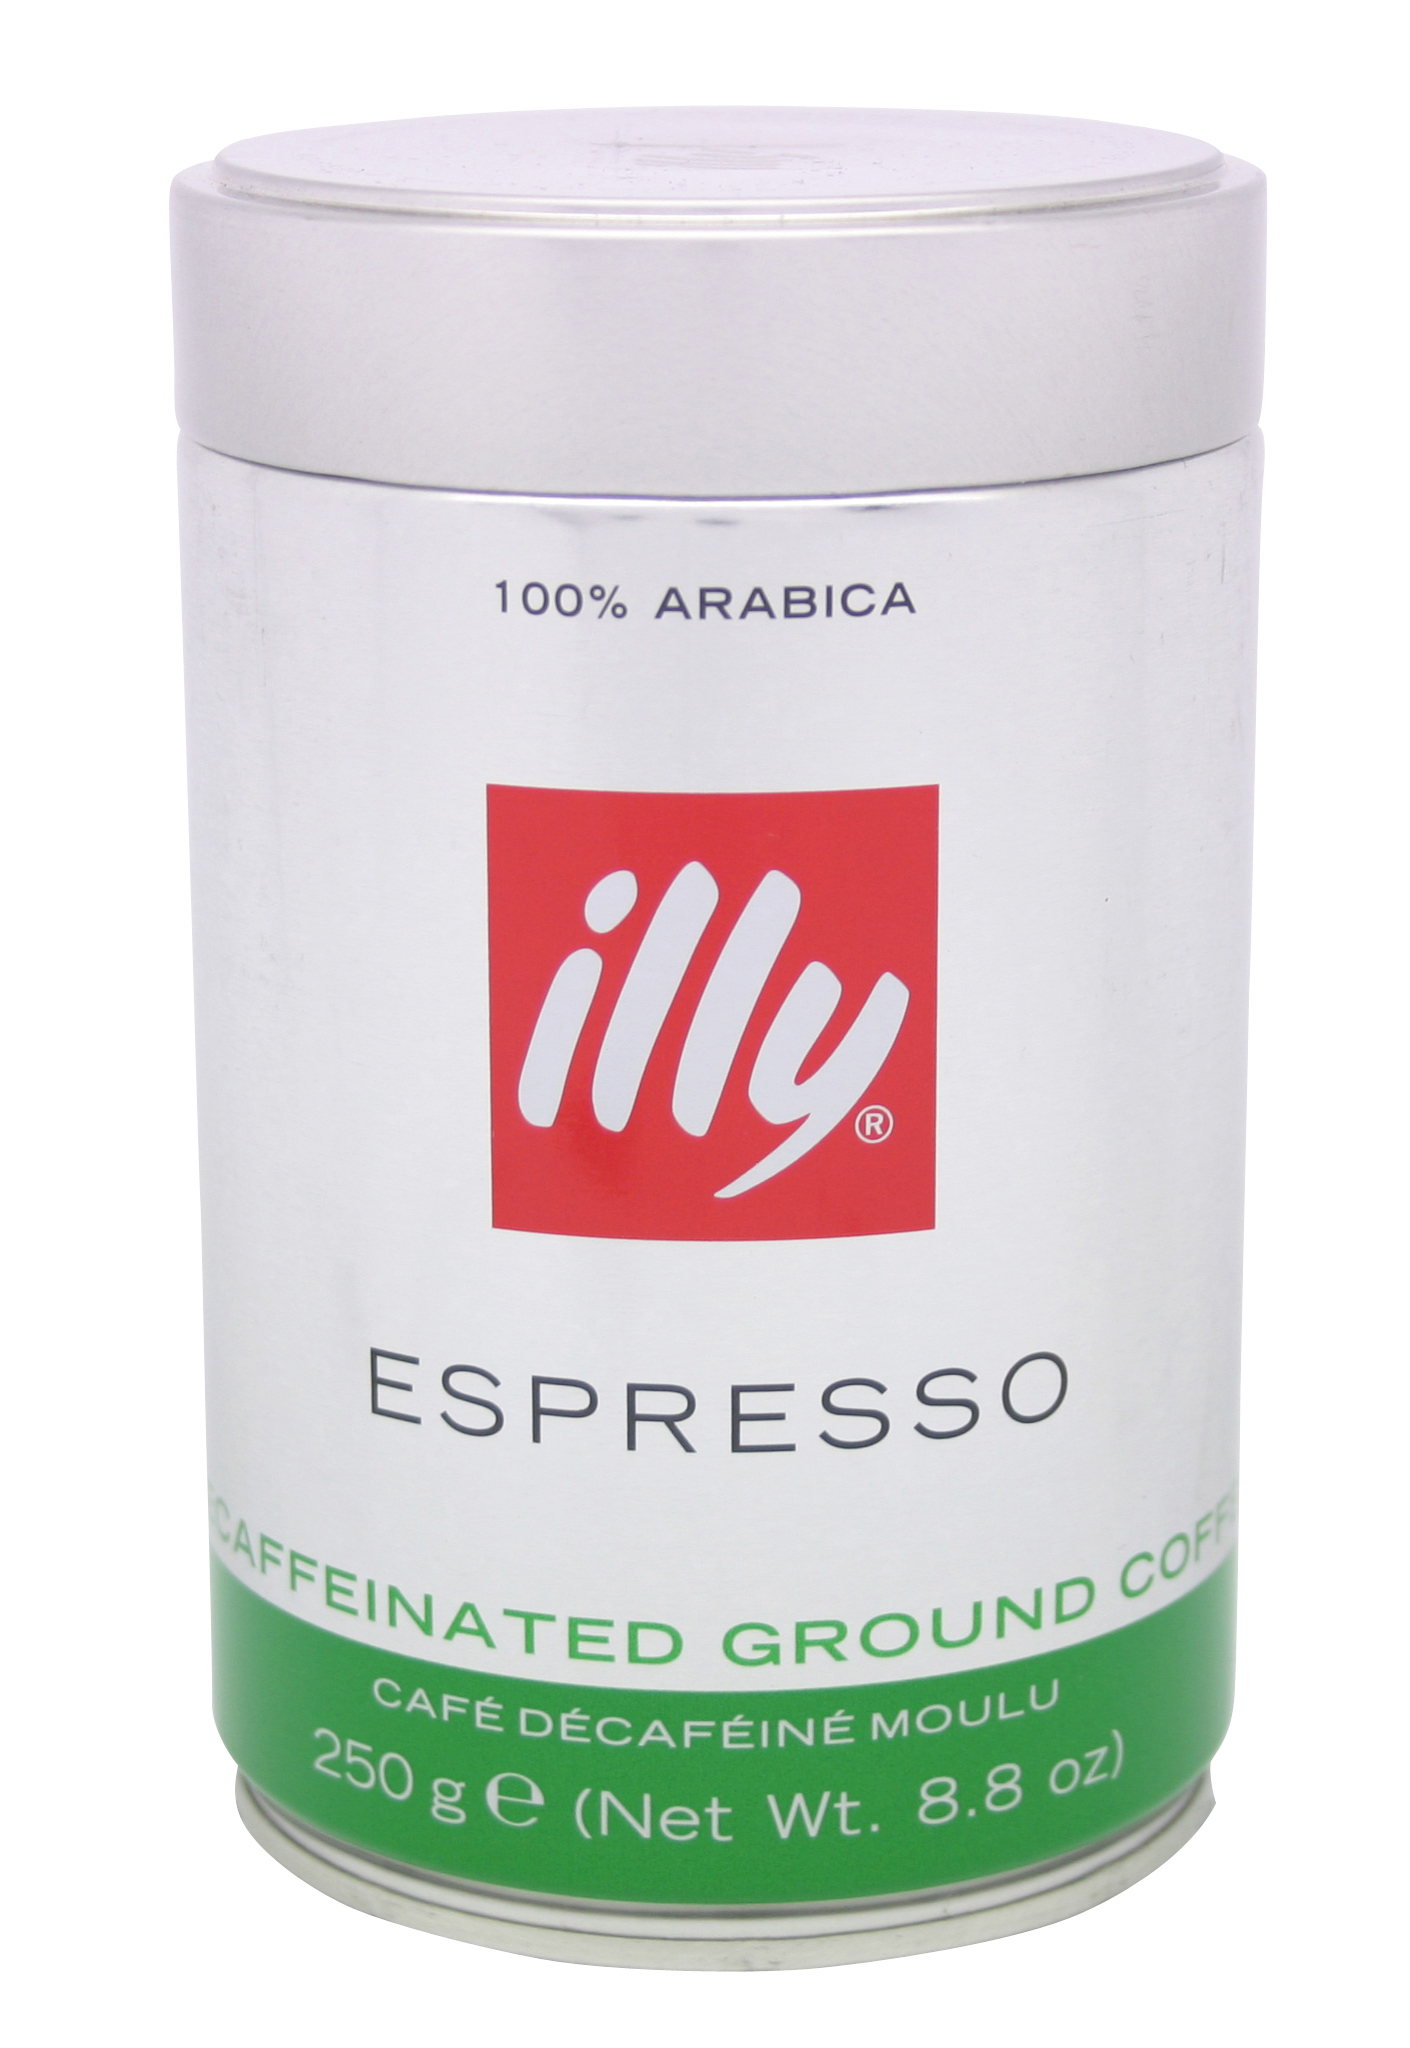 illy decaffeinated2